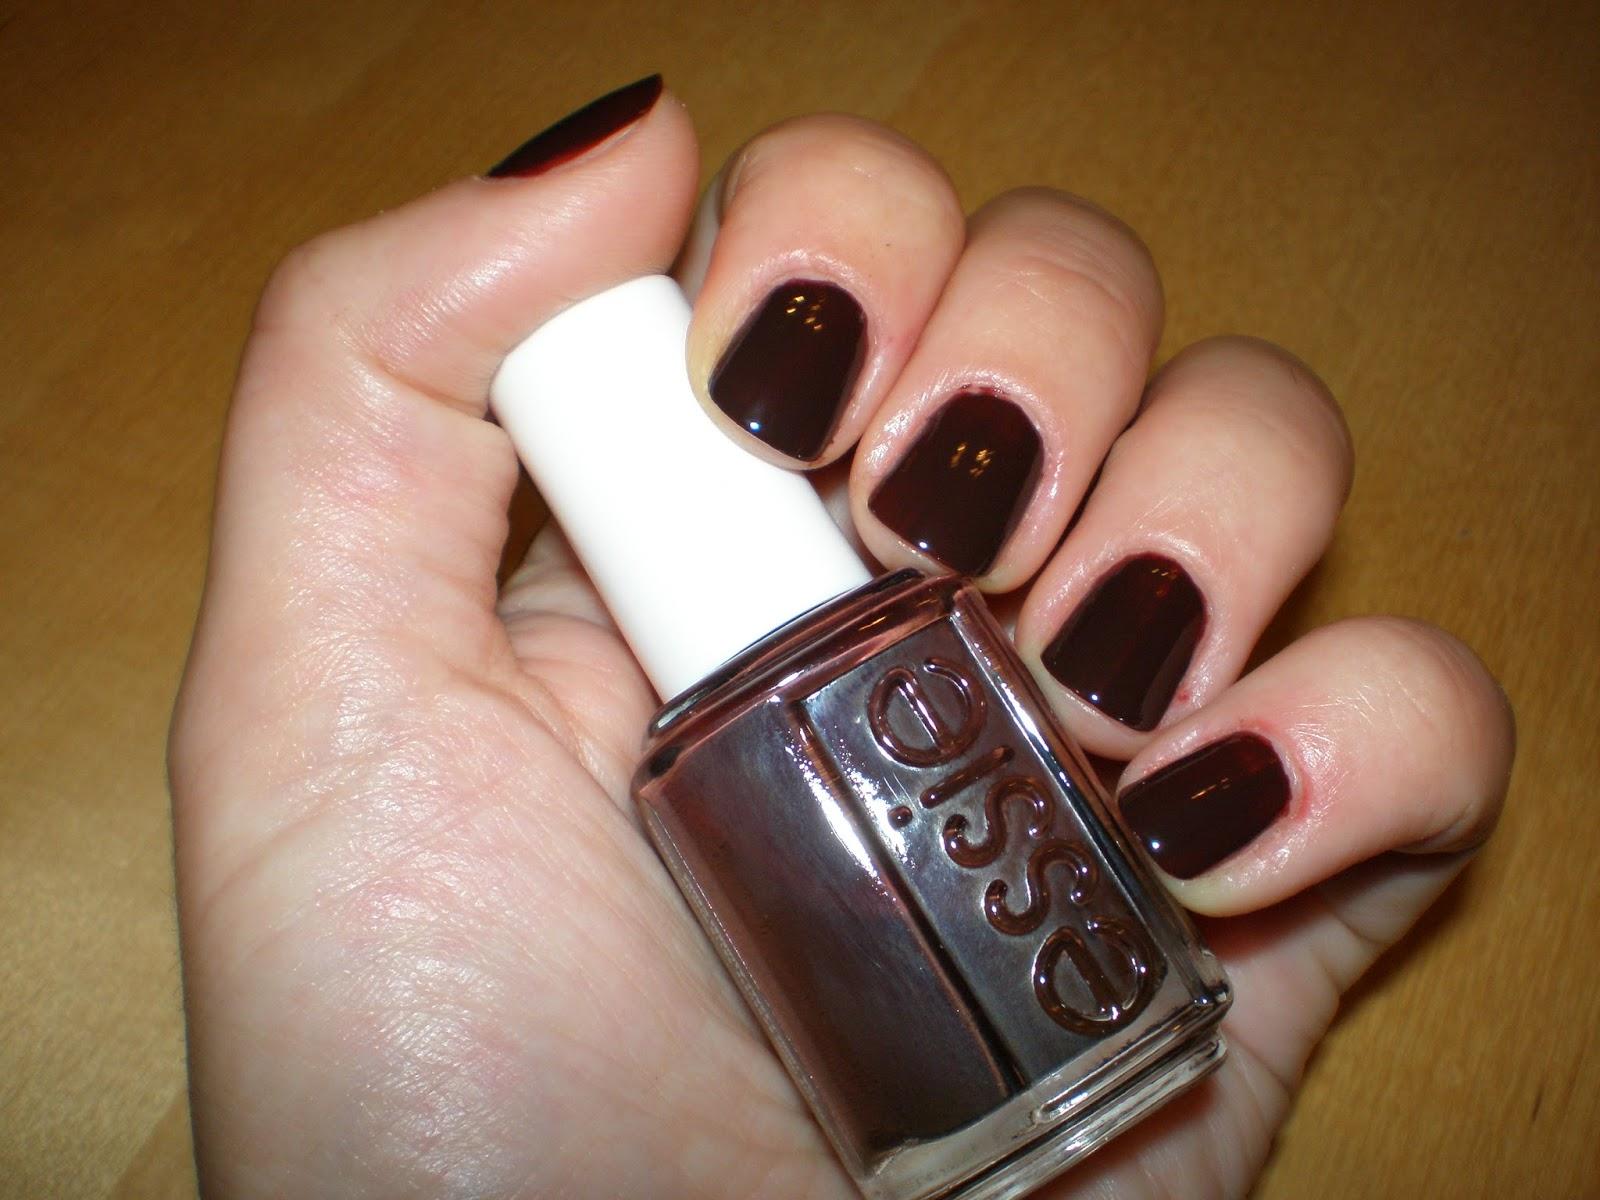 Essie nail polish in Lady Godiva